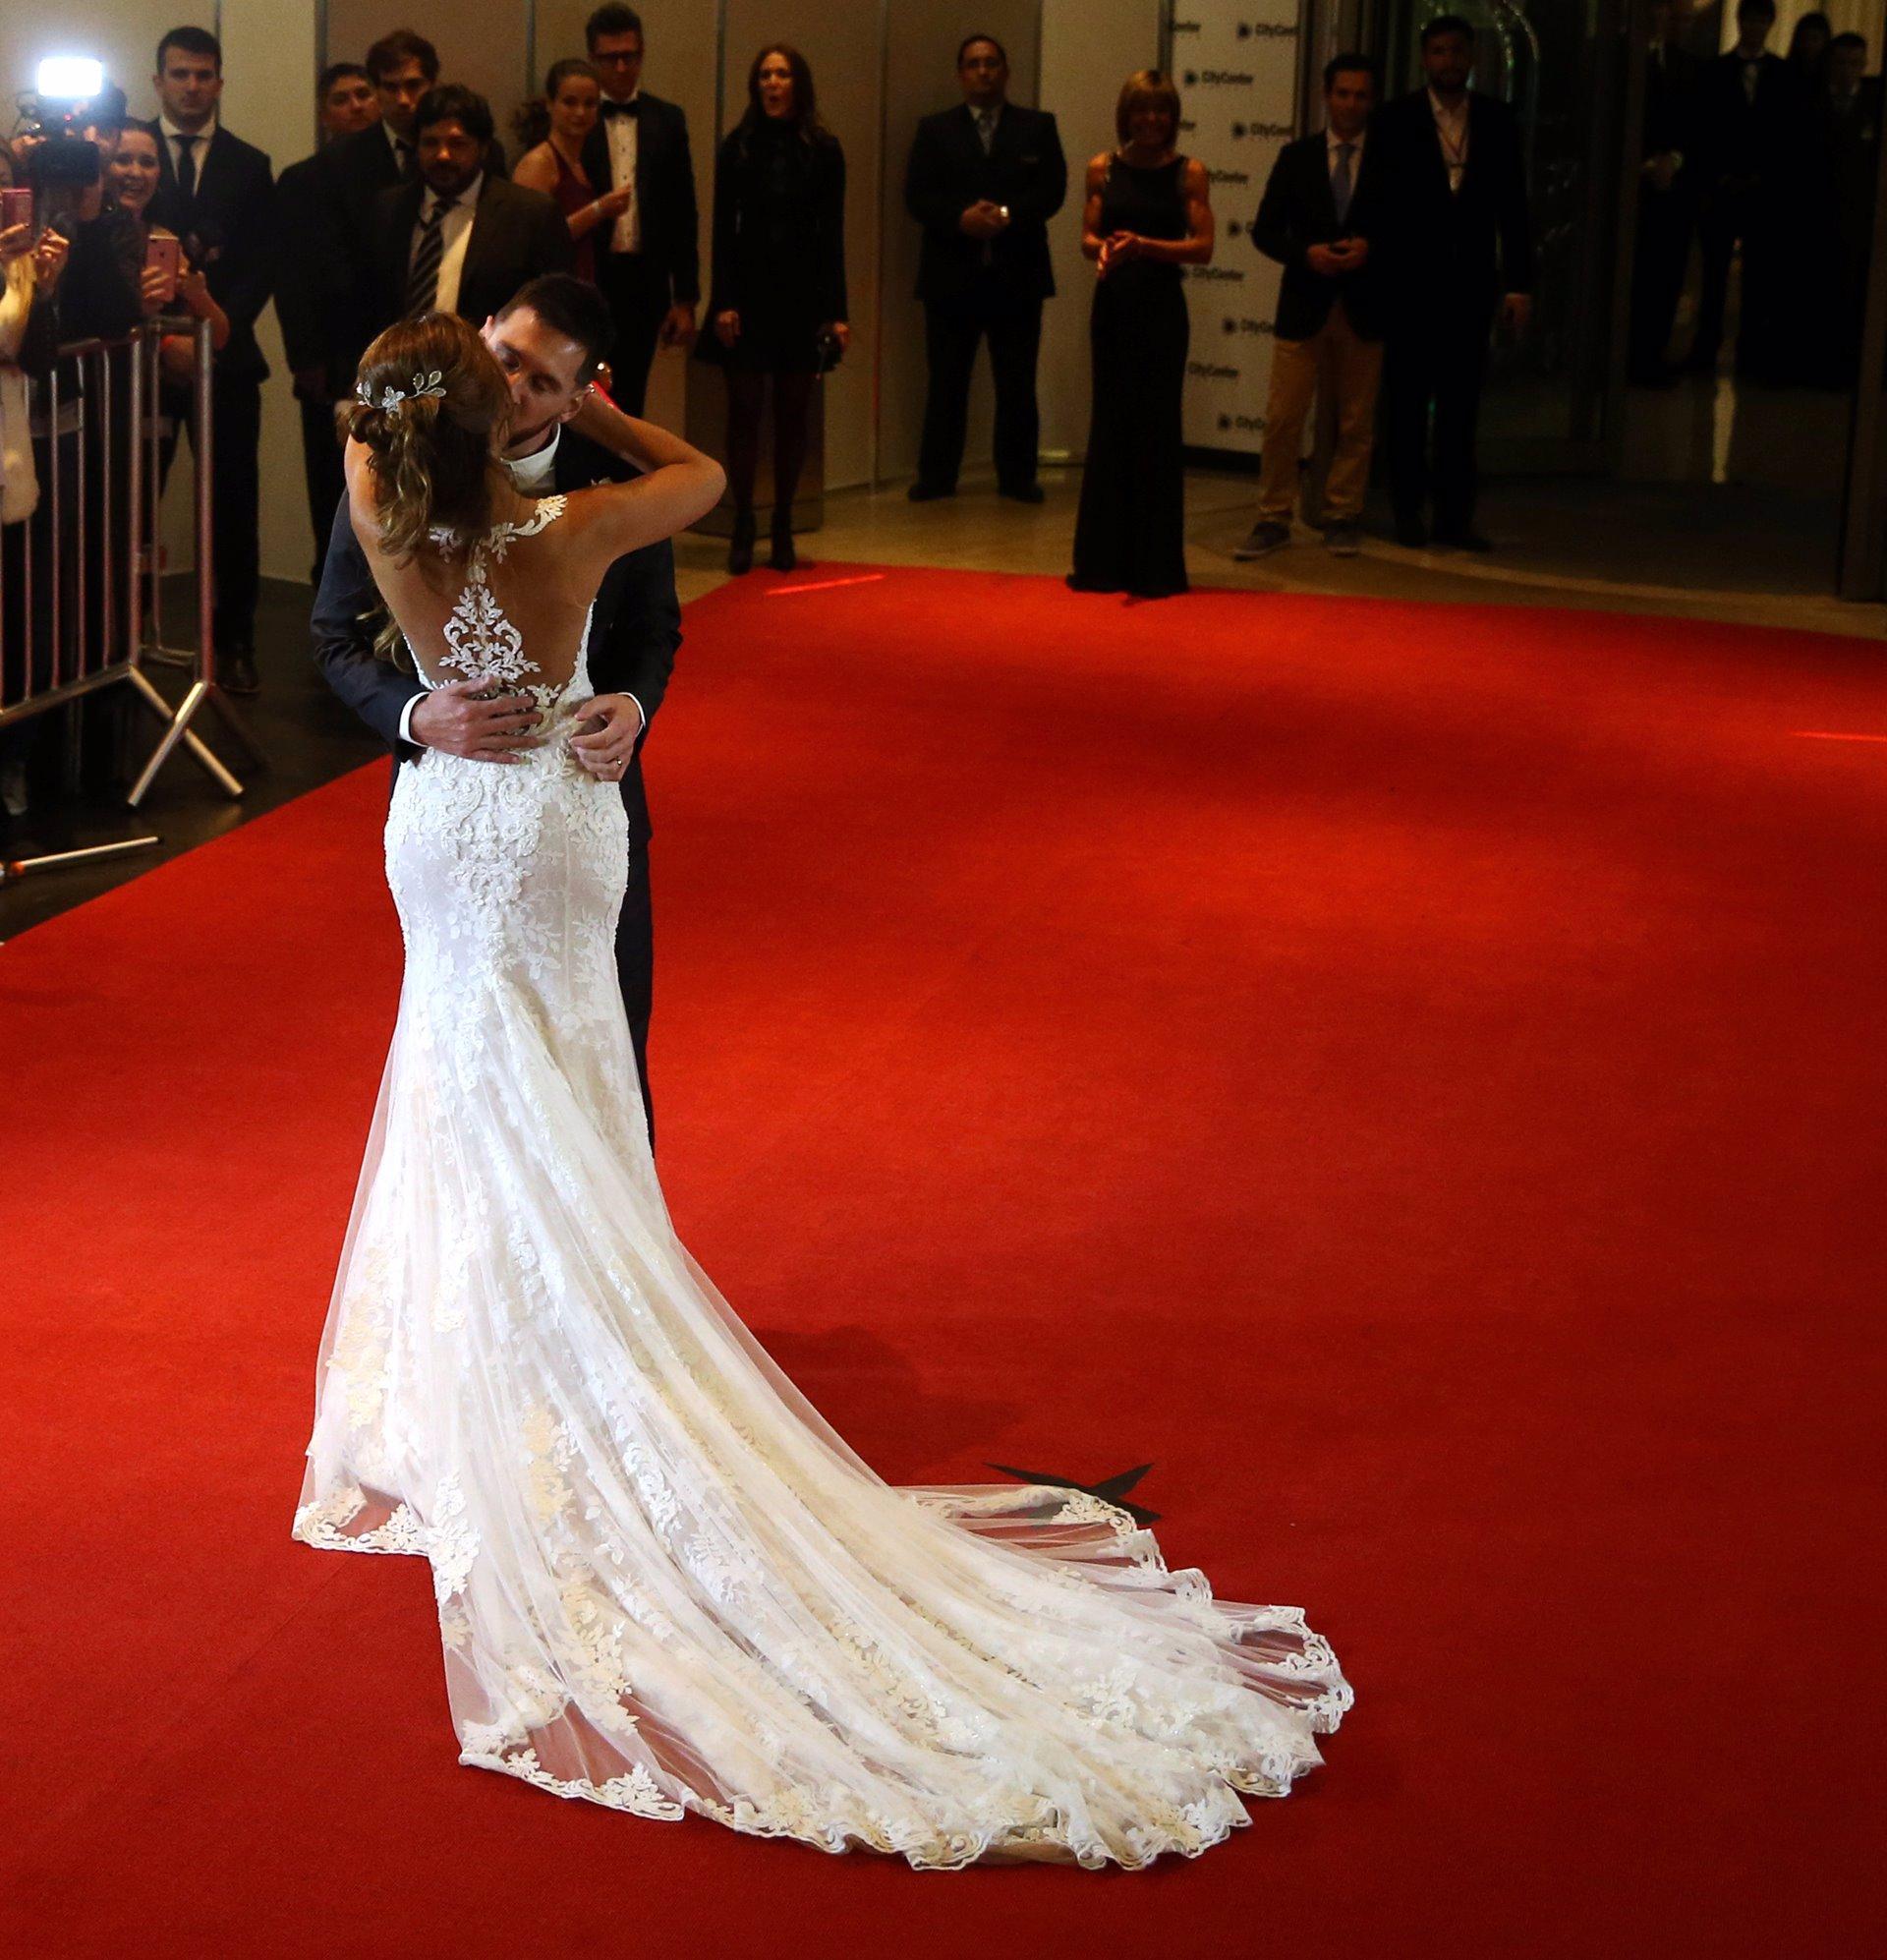 Vestido de novia mujer de messi